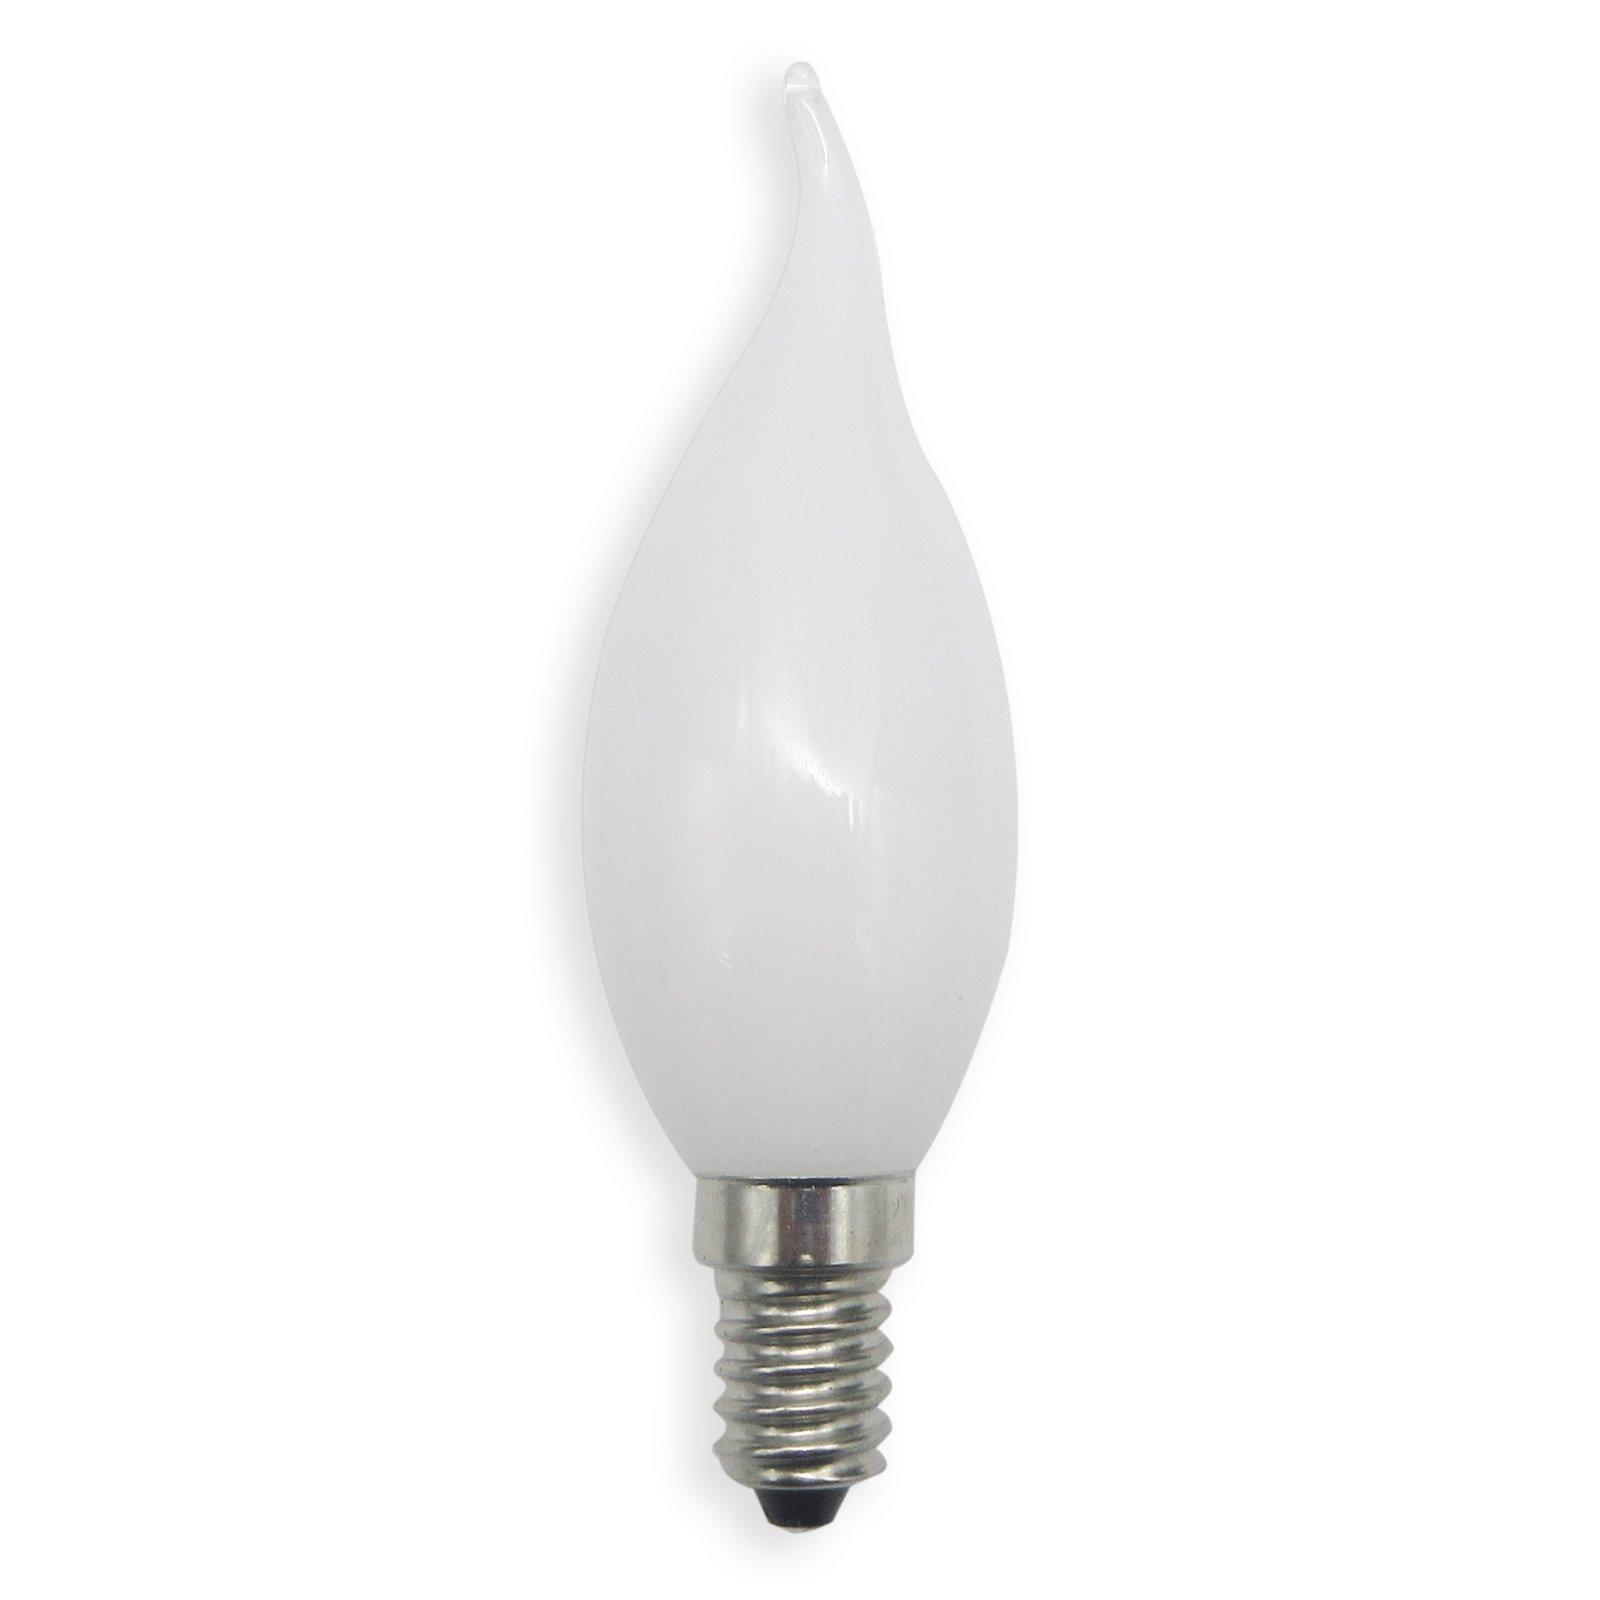 led windsto lampe nostalgia lightme e14 3 w warmwei led leuchtmittel leuchtmittel. Black Bedroom Furniture Sets. Home Design Ideas